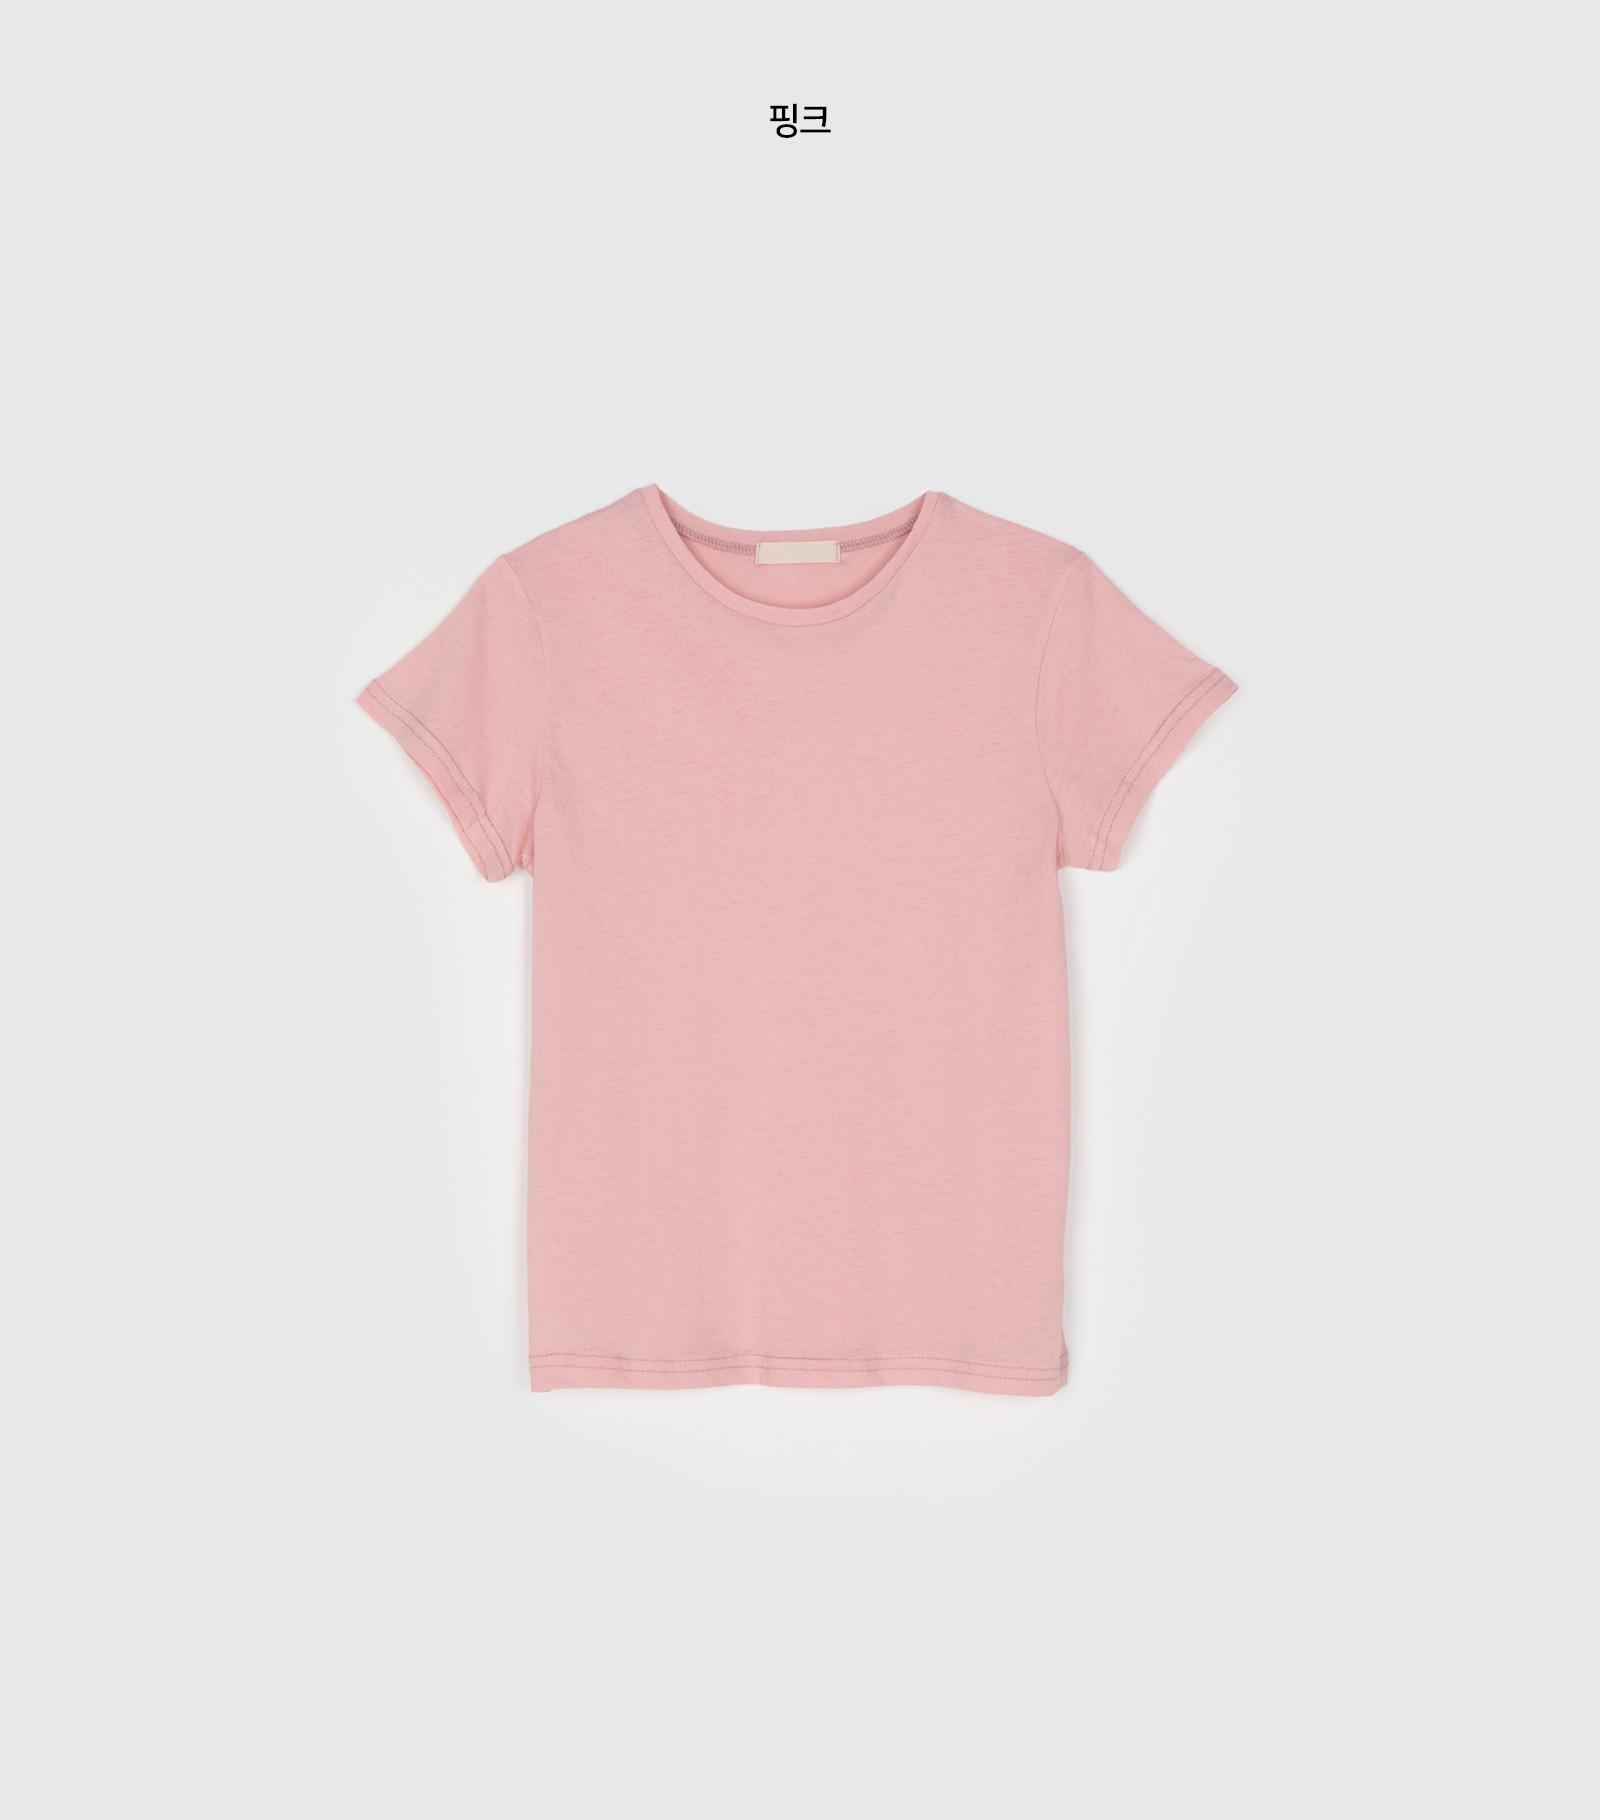 Aqua Basic Modal Round Neck T-Shirt